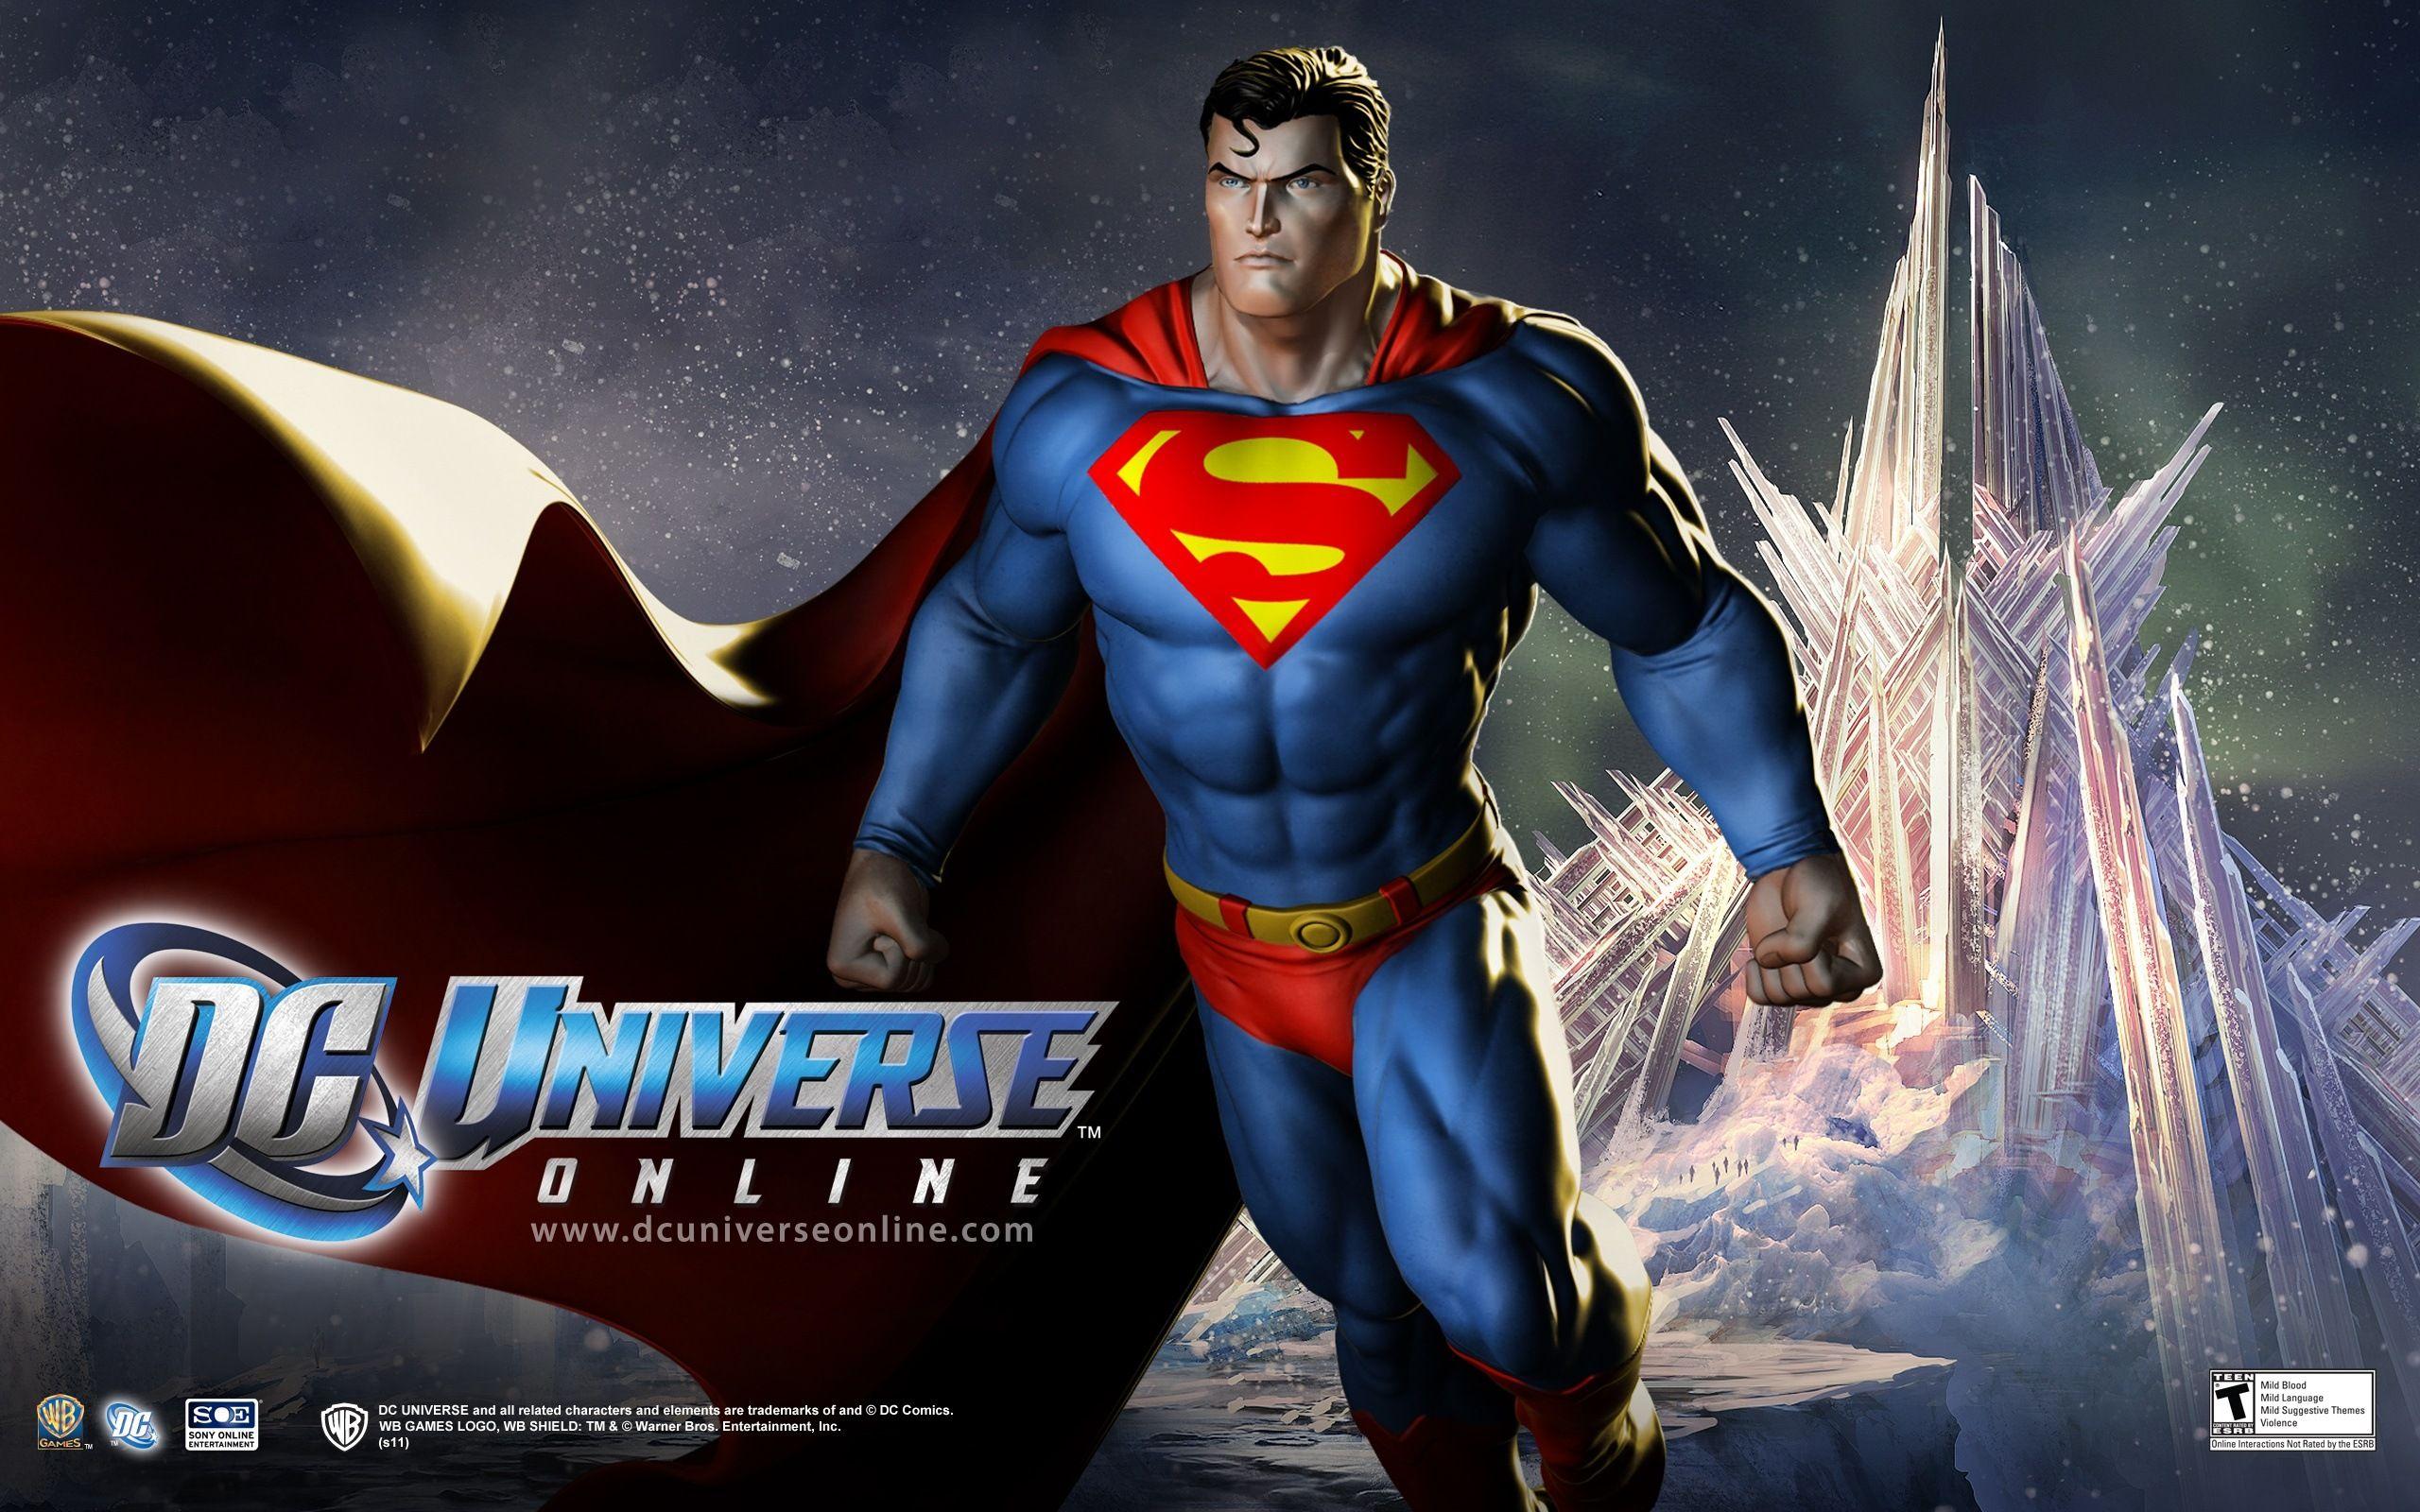 Dc Universe Online Wallpaper 2560x1600 Id 24108 Superman Superhero Superhero Comic